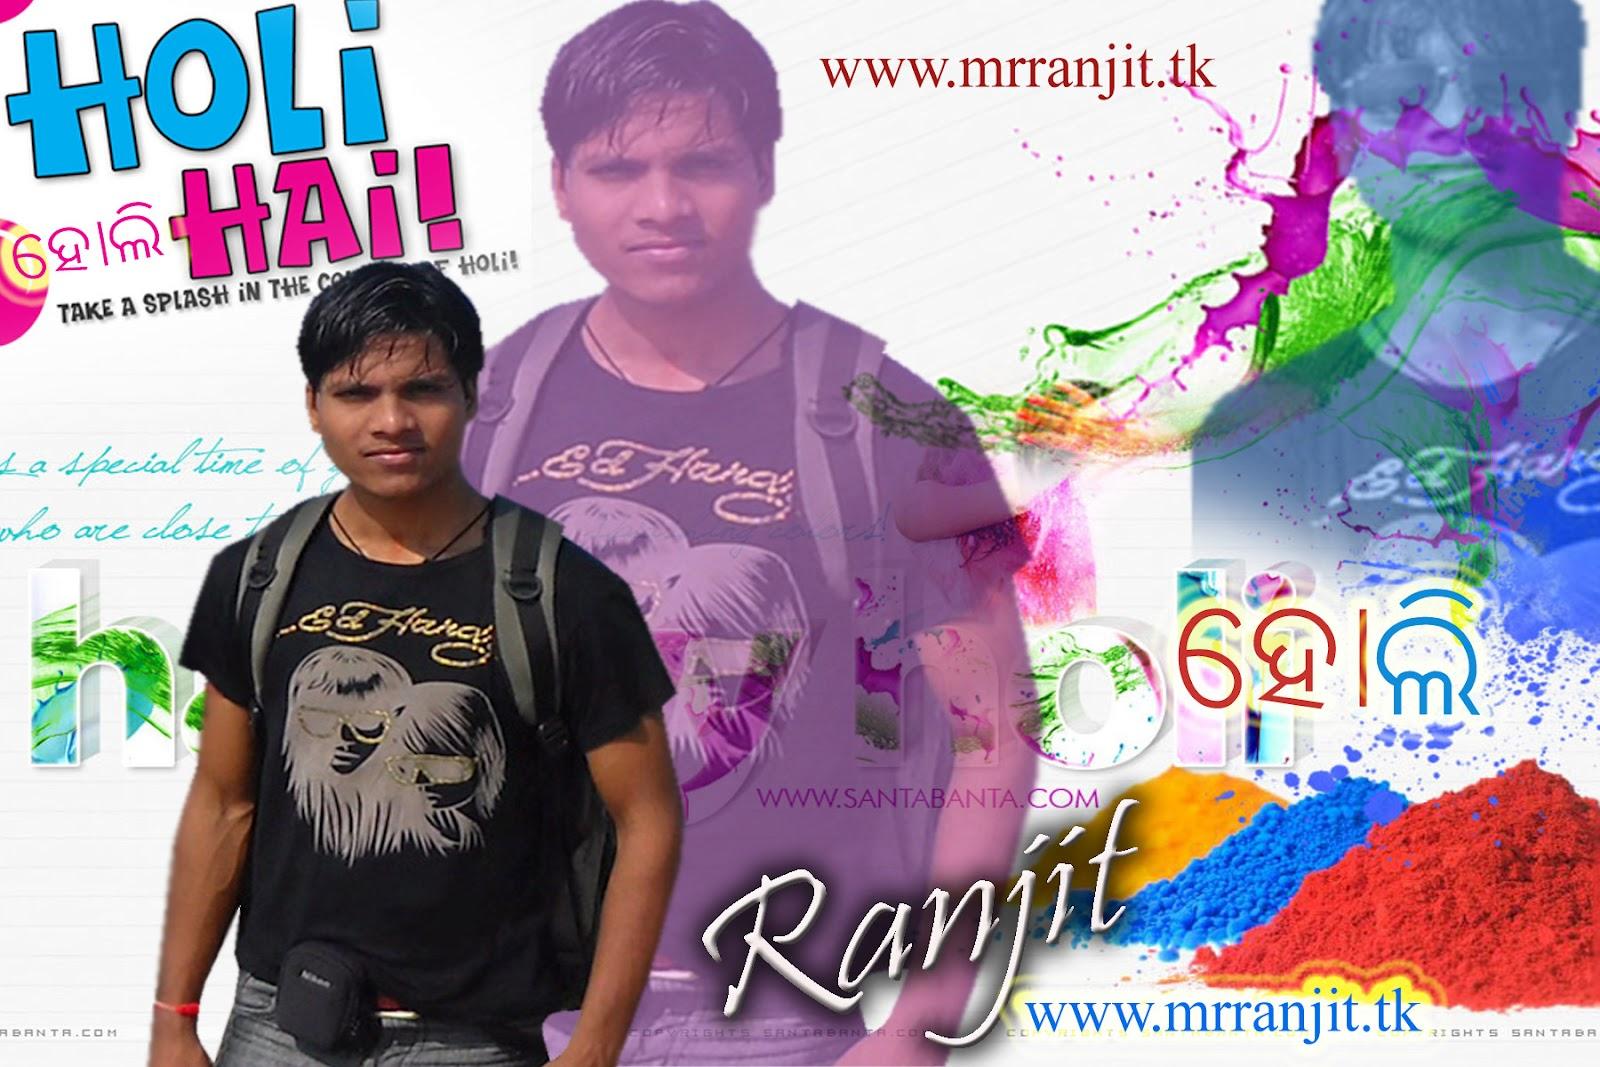 http://2.bp.blogspot.com/-d0-Nr6NDnck/T1HpwYGbhdI/AAAAAAAAARg/Mcmpqf3sCKM/s1600/RANJIT+Holi+4+facebook.jpg